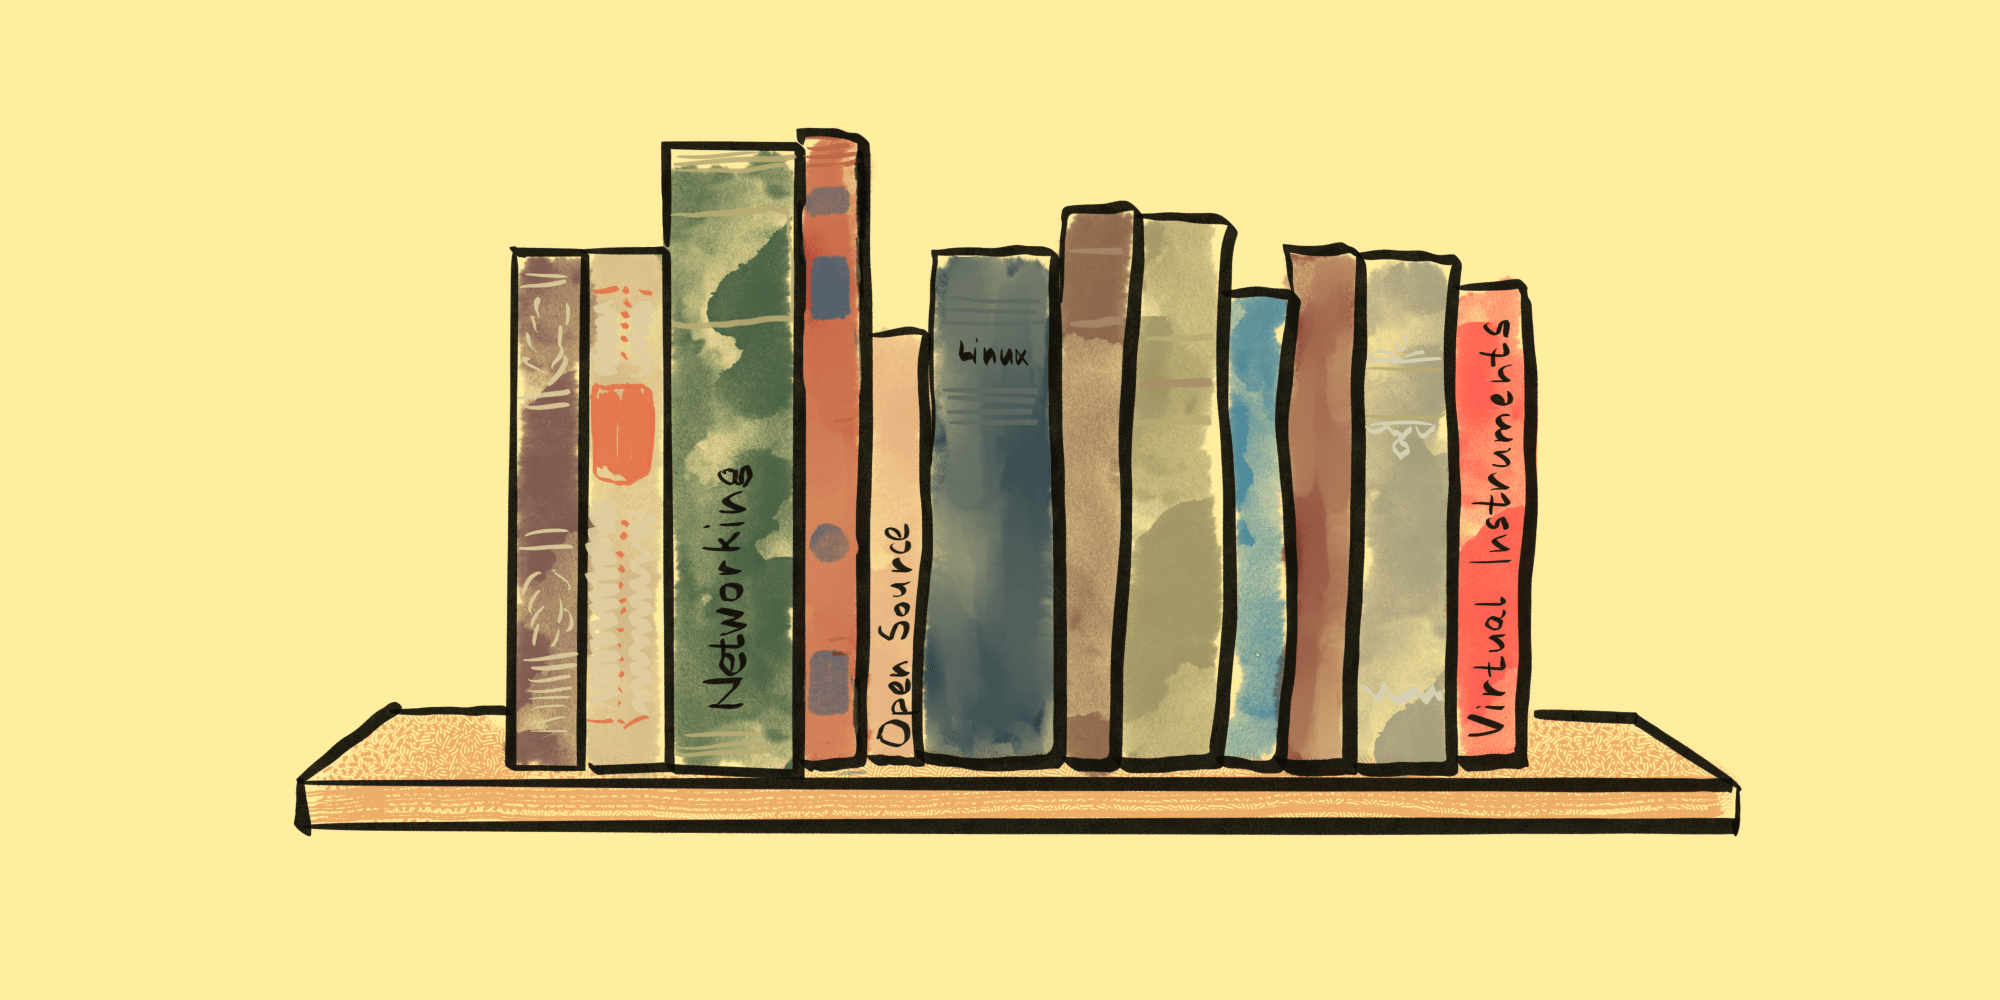 7 лучших читалок книг для Android, iOS и десктопа